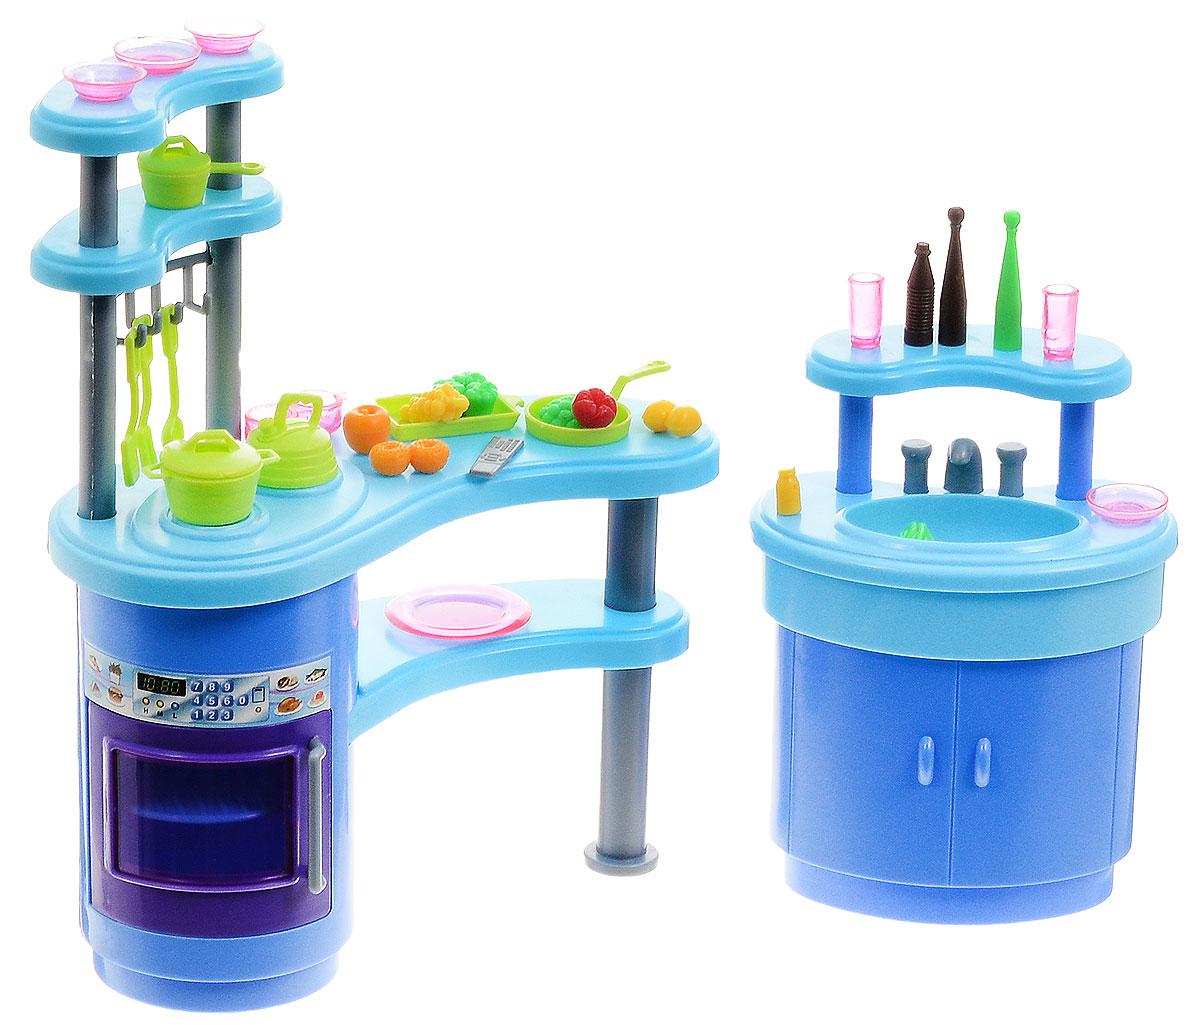 1TOY Набор мебели для кукол Кухня Красотка 1toy 1toy карета с лошадью для кукол 1 местн т53235